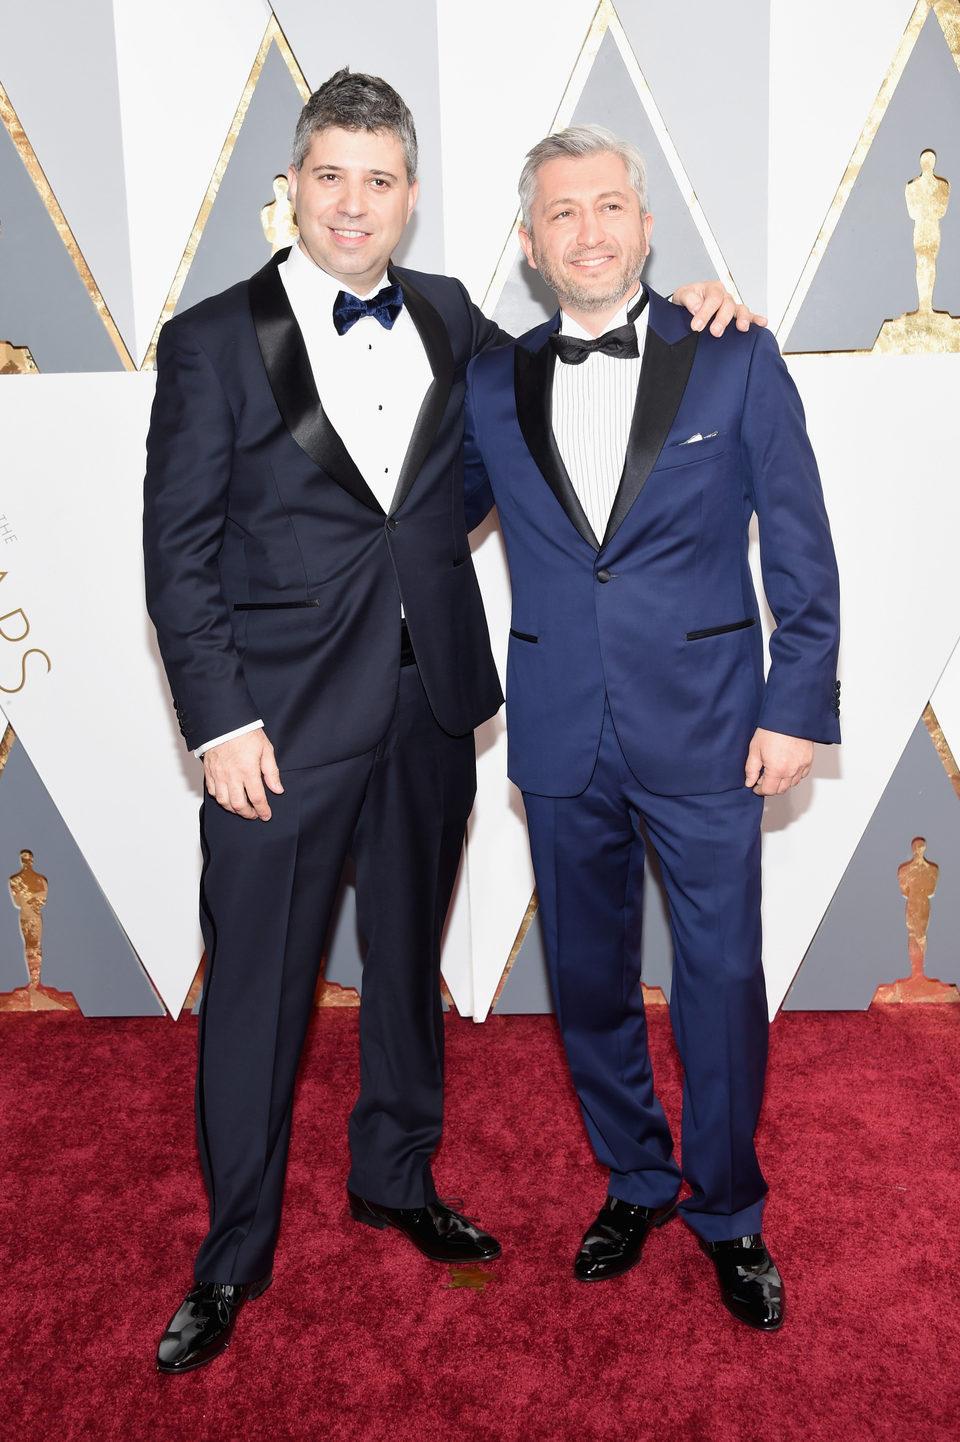 Evgeny Afineevsky at the Oscars 2016 red carpet